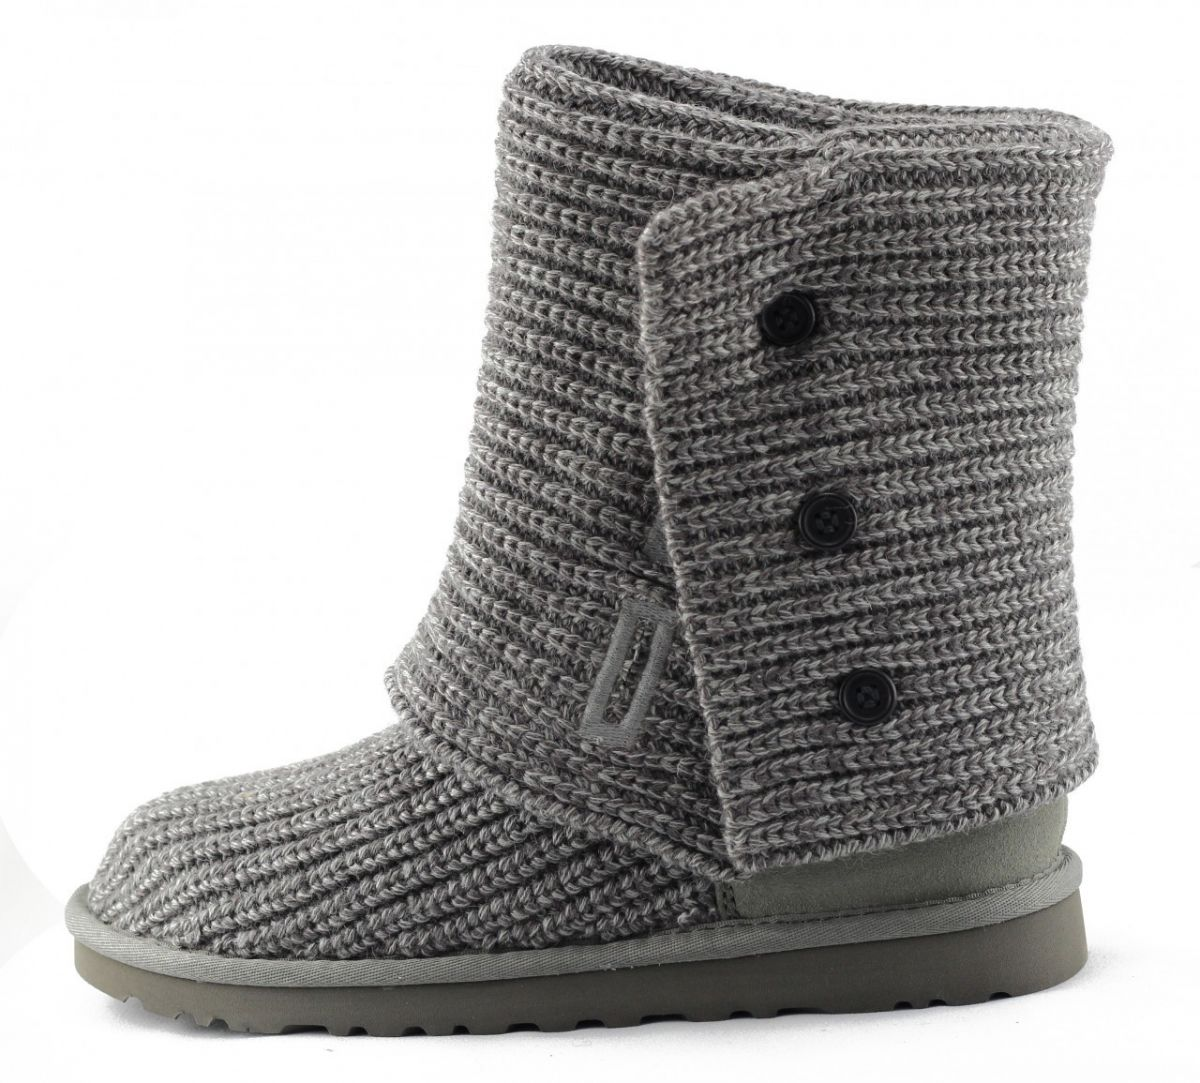 7c33ad36ad7 UGG Australia for Women: Cardy Grey Boots Grey